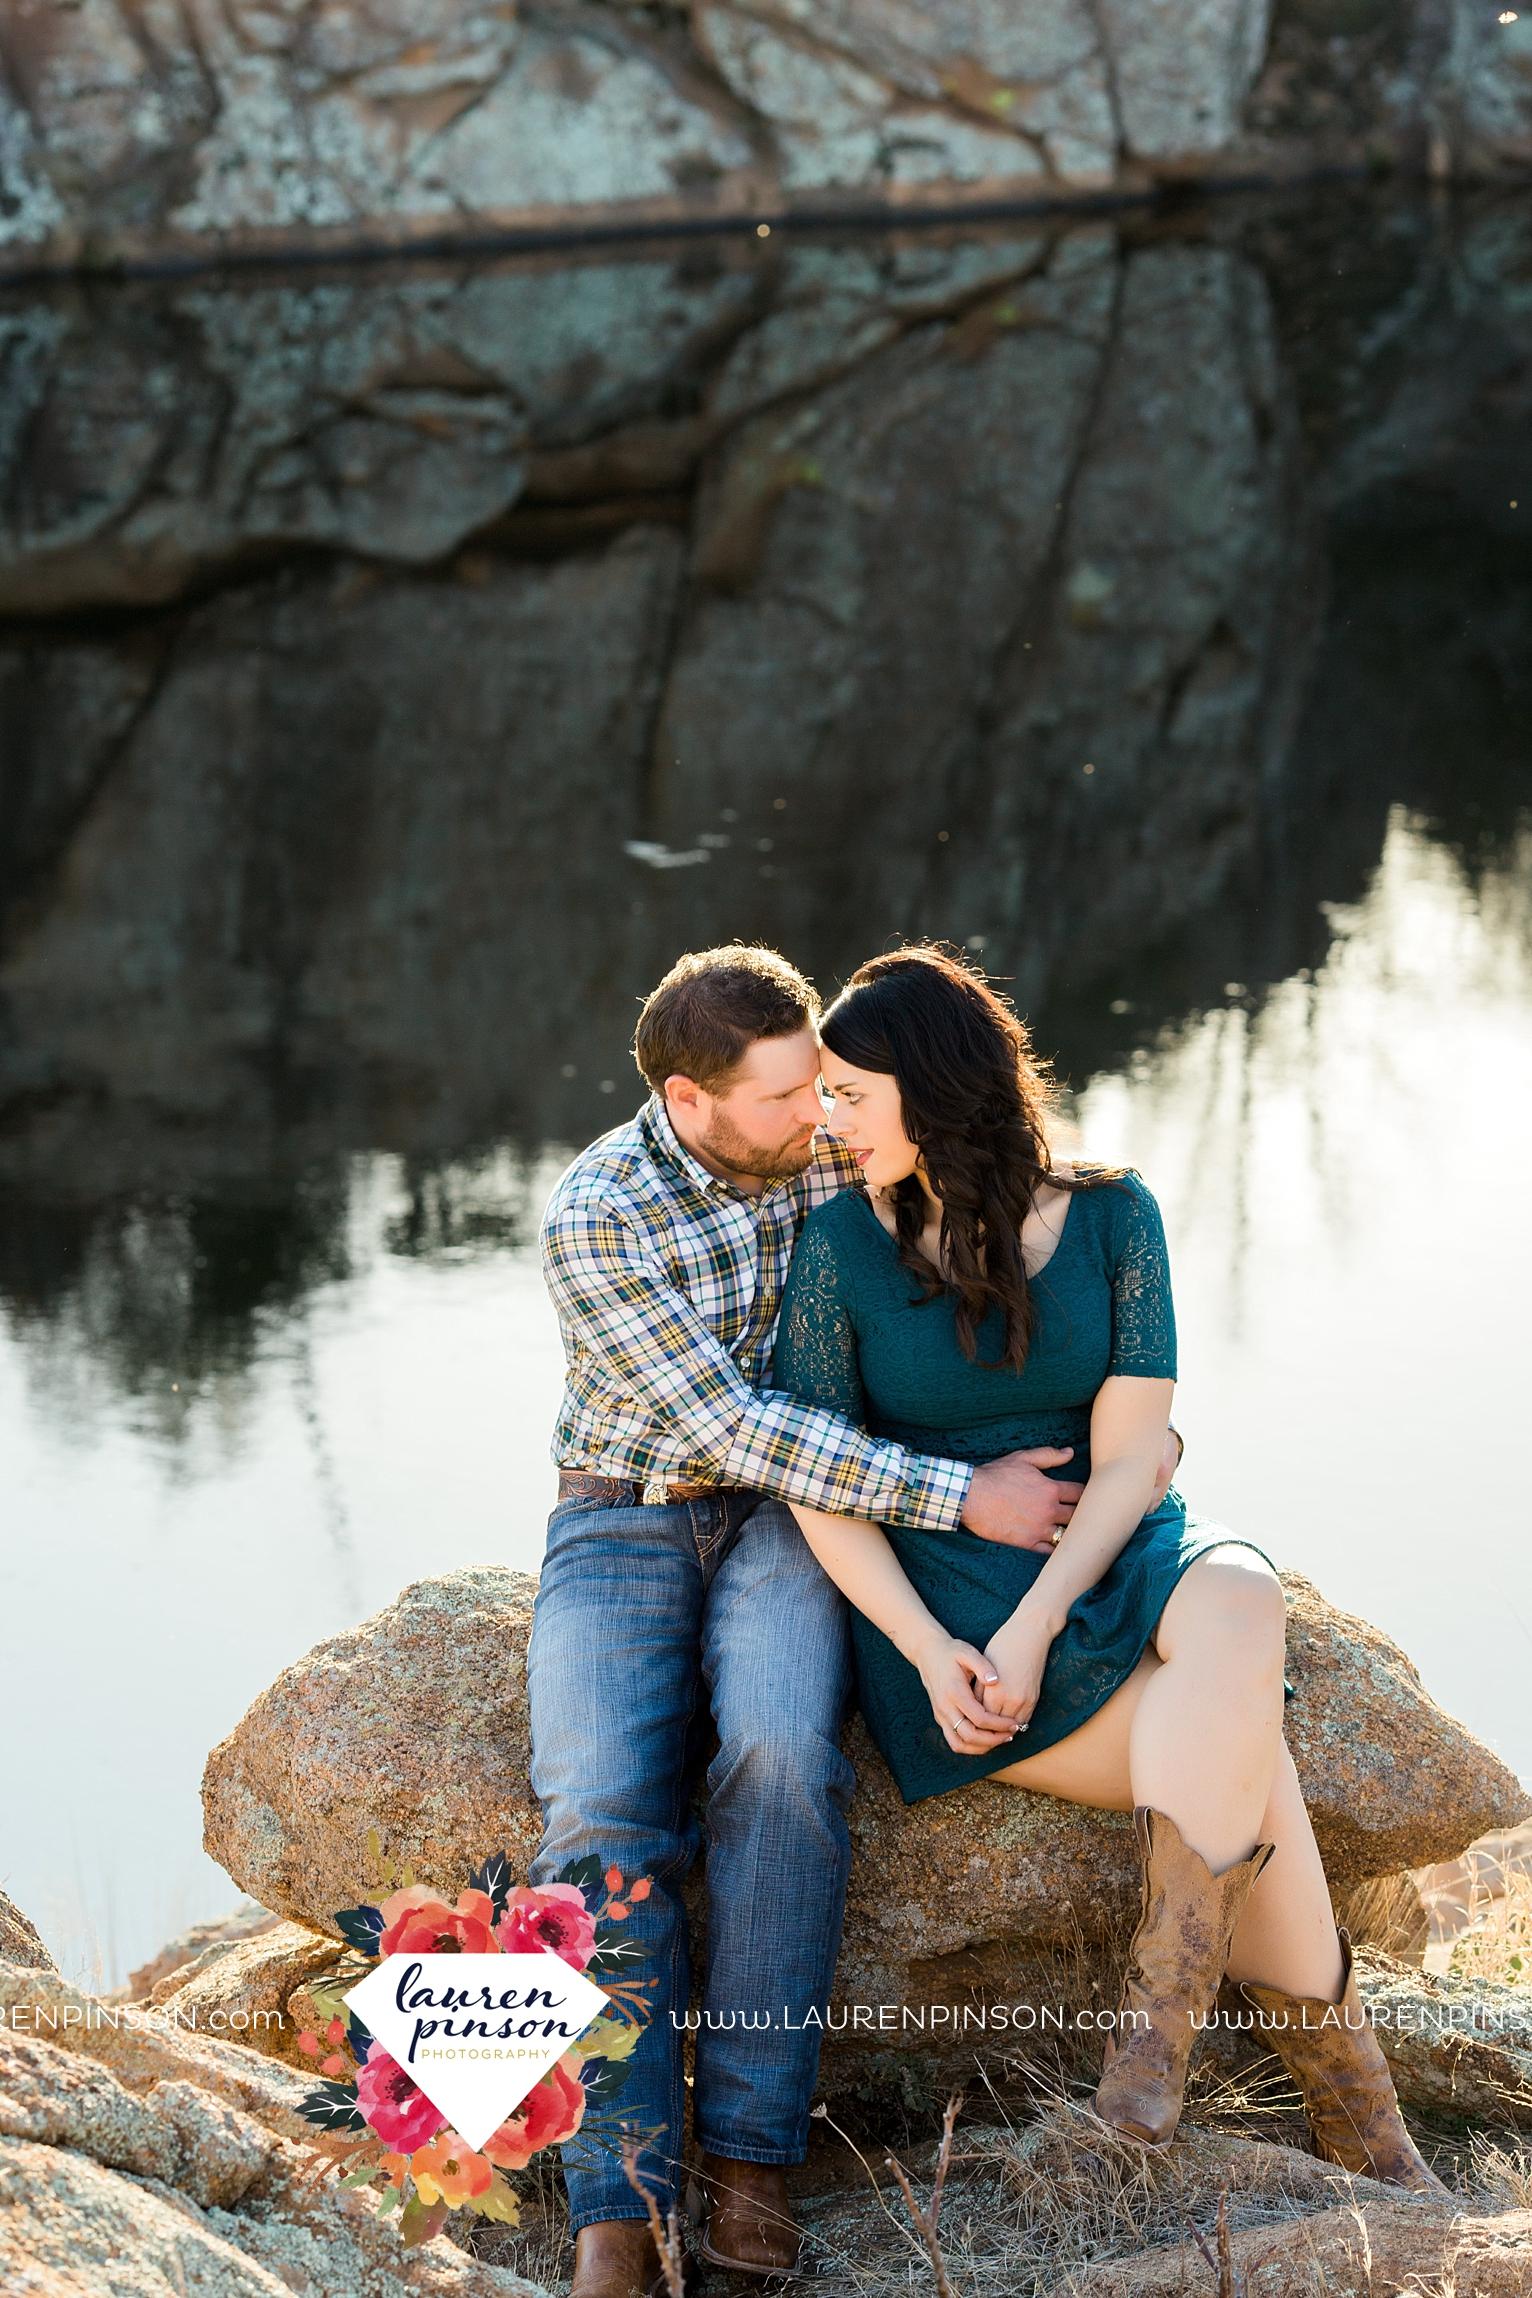 wichita-falls-texas-engagement-photographer-wedding-oklahoma-lawton-wichita-mountains-refuge-outdoors-mountains-engaged_2056.jpg